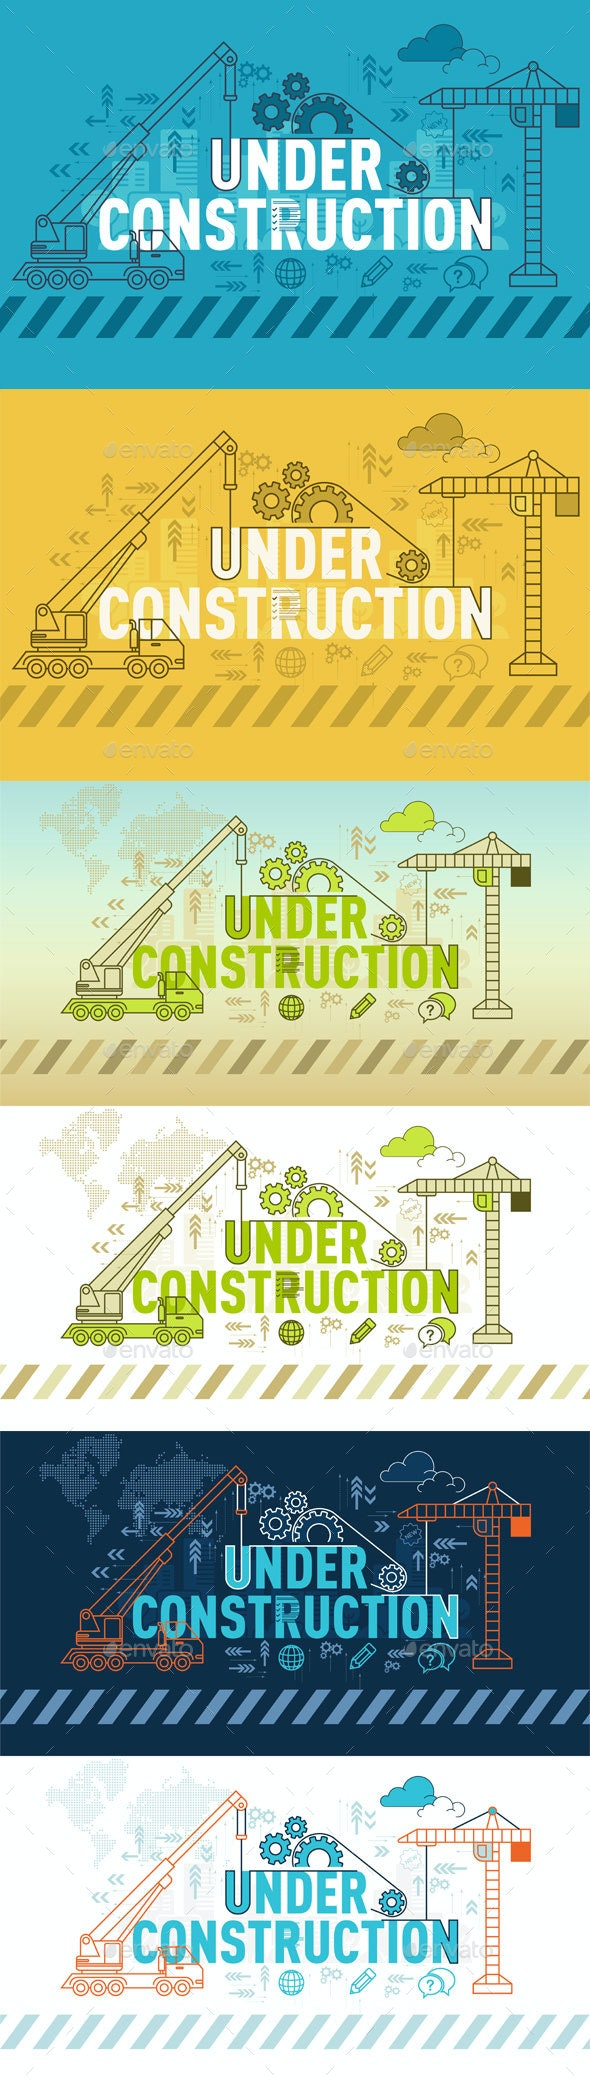 Under Construction Website Banner Design Concept